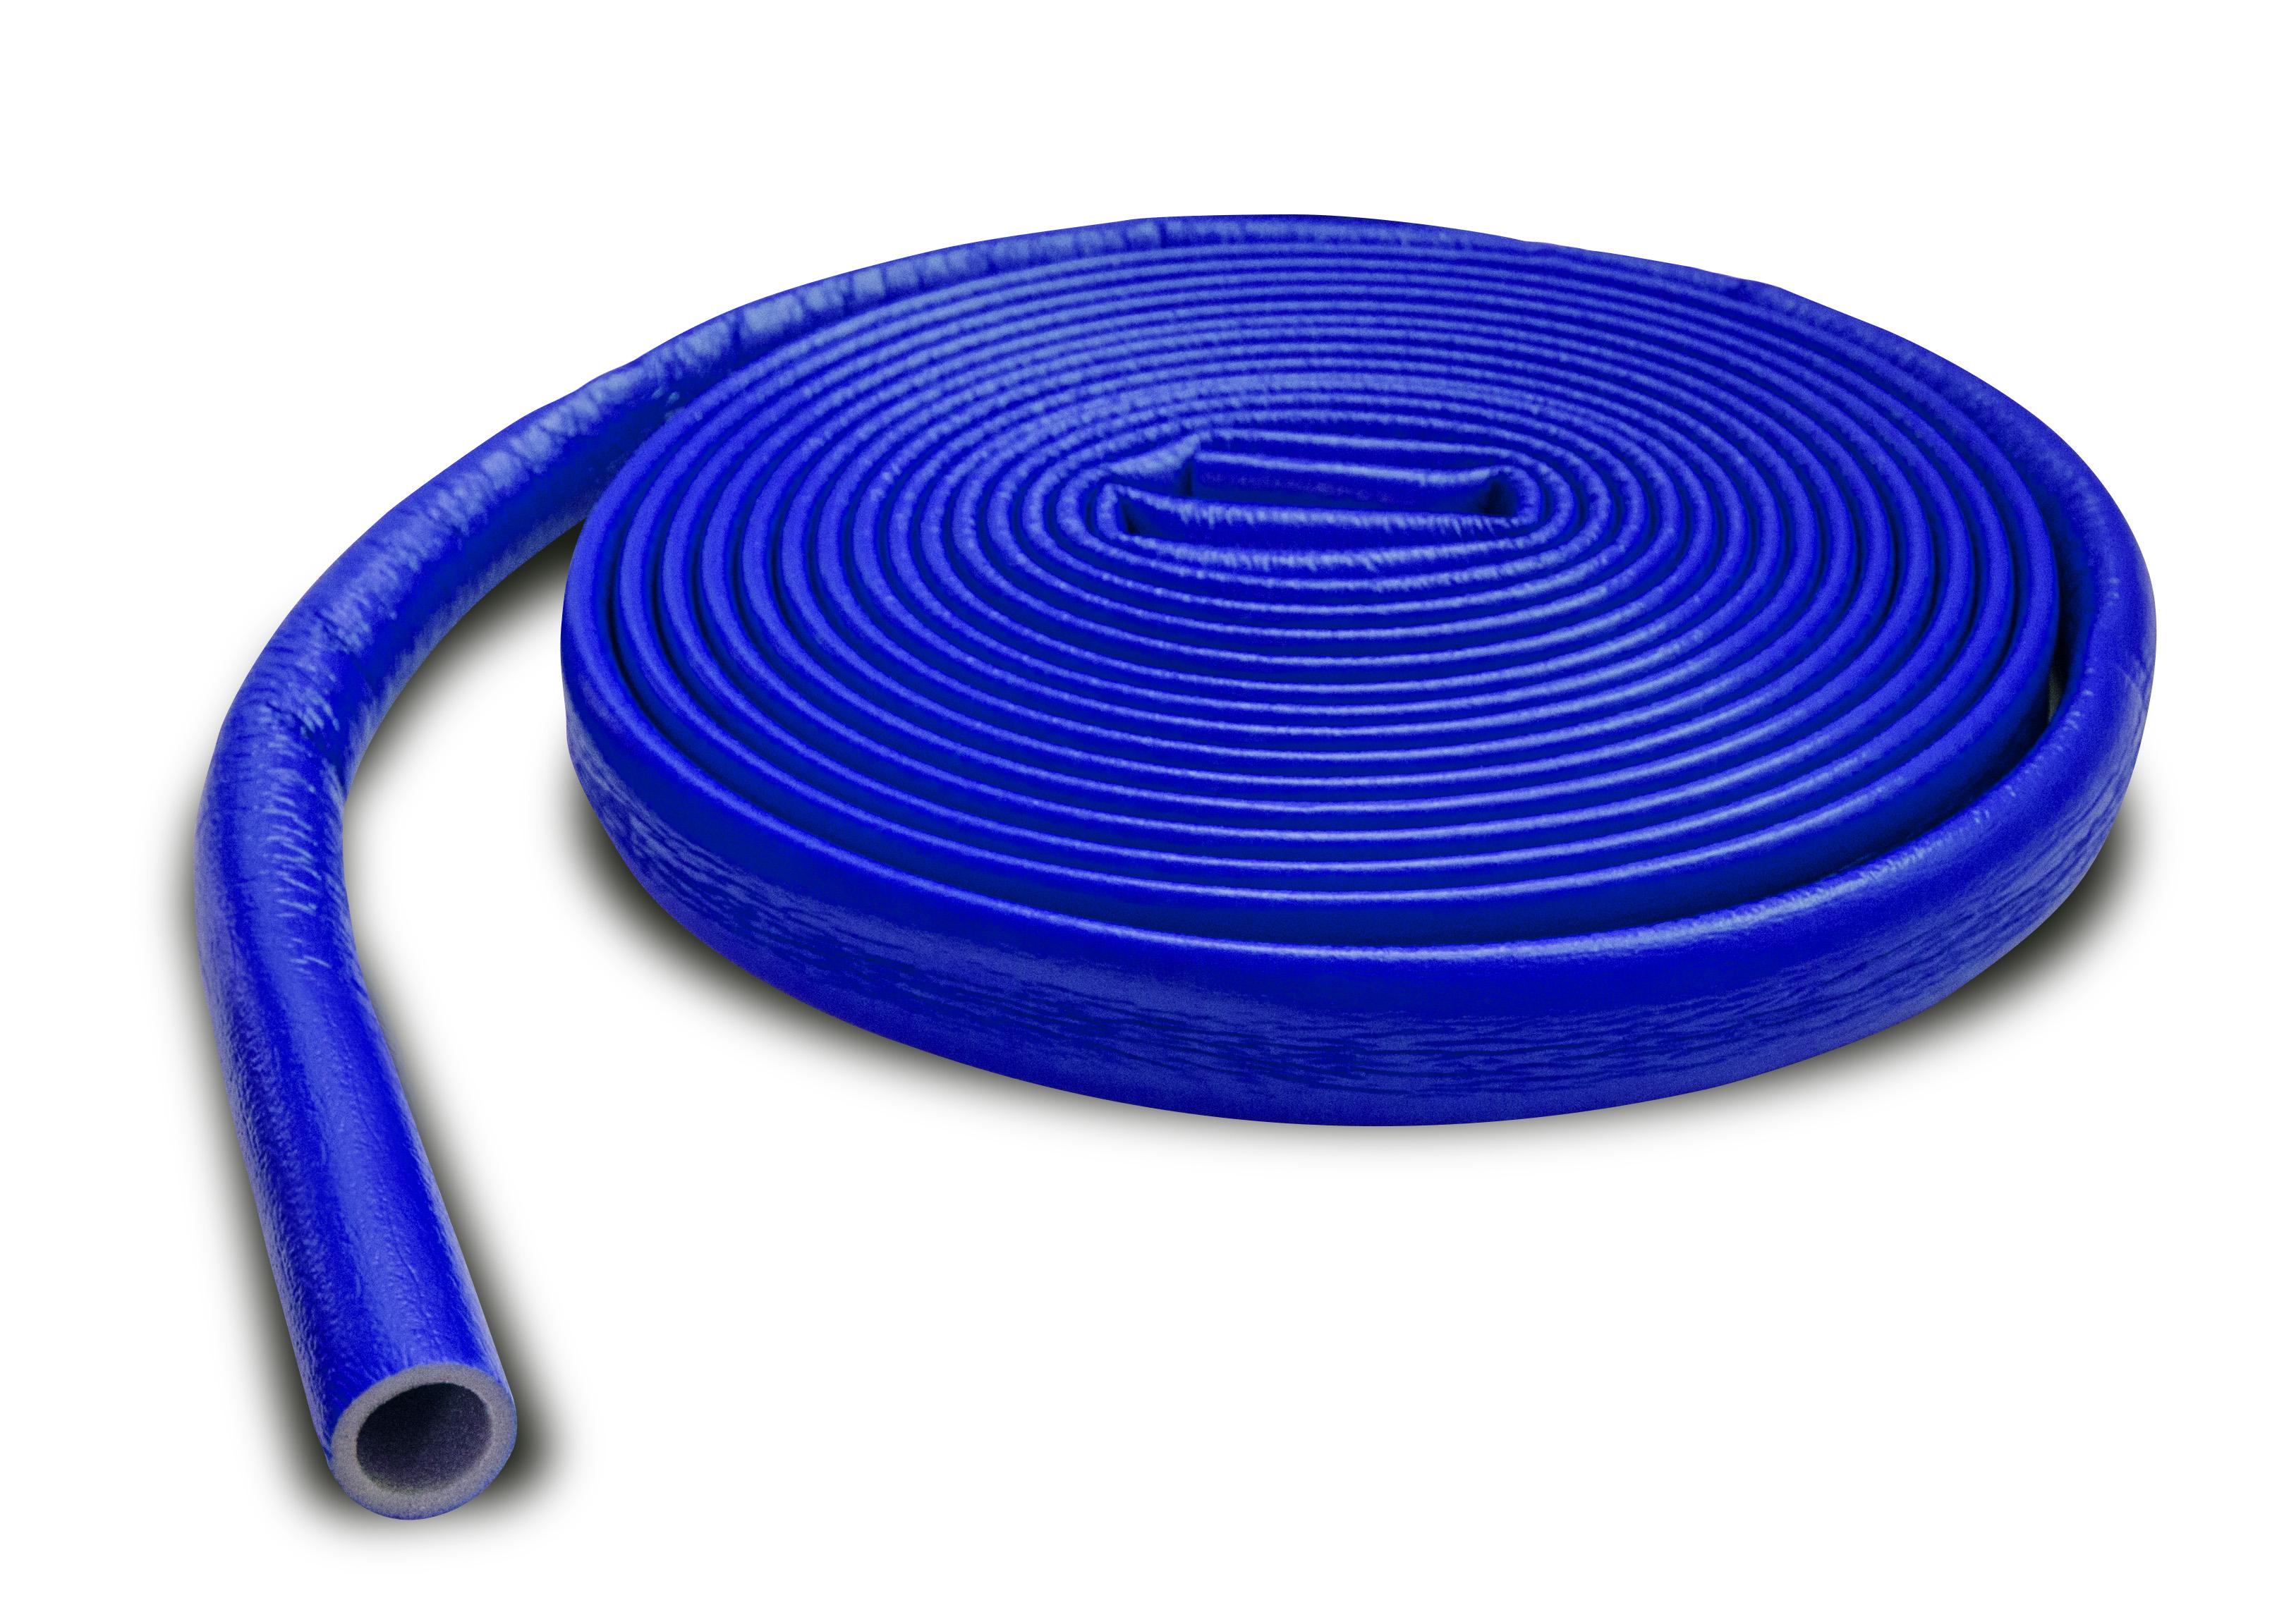 Трубки Тилит Супер Протект-С толщ.9, диам.28 (100 п.м.)